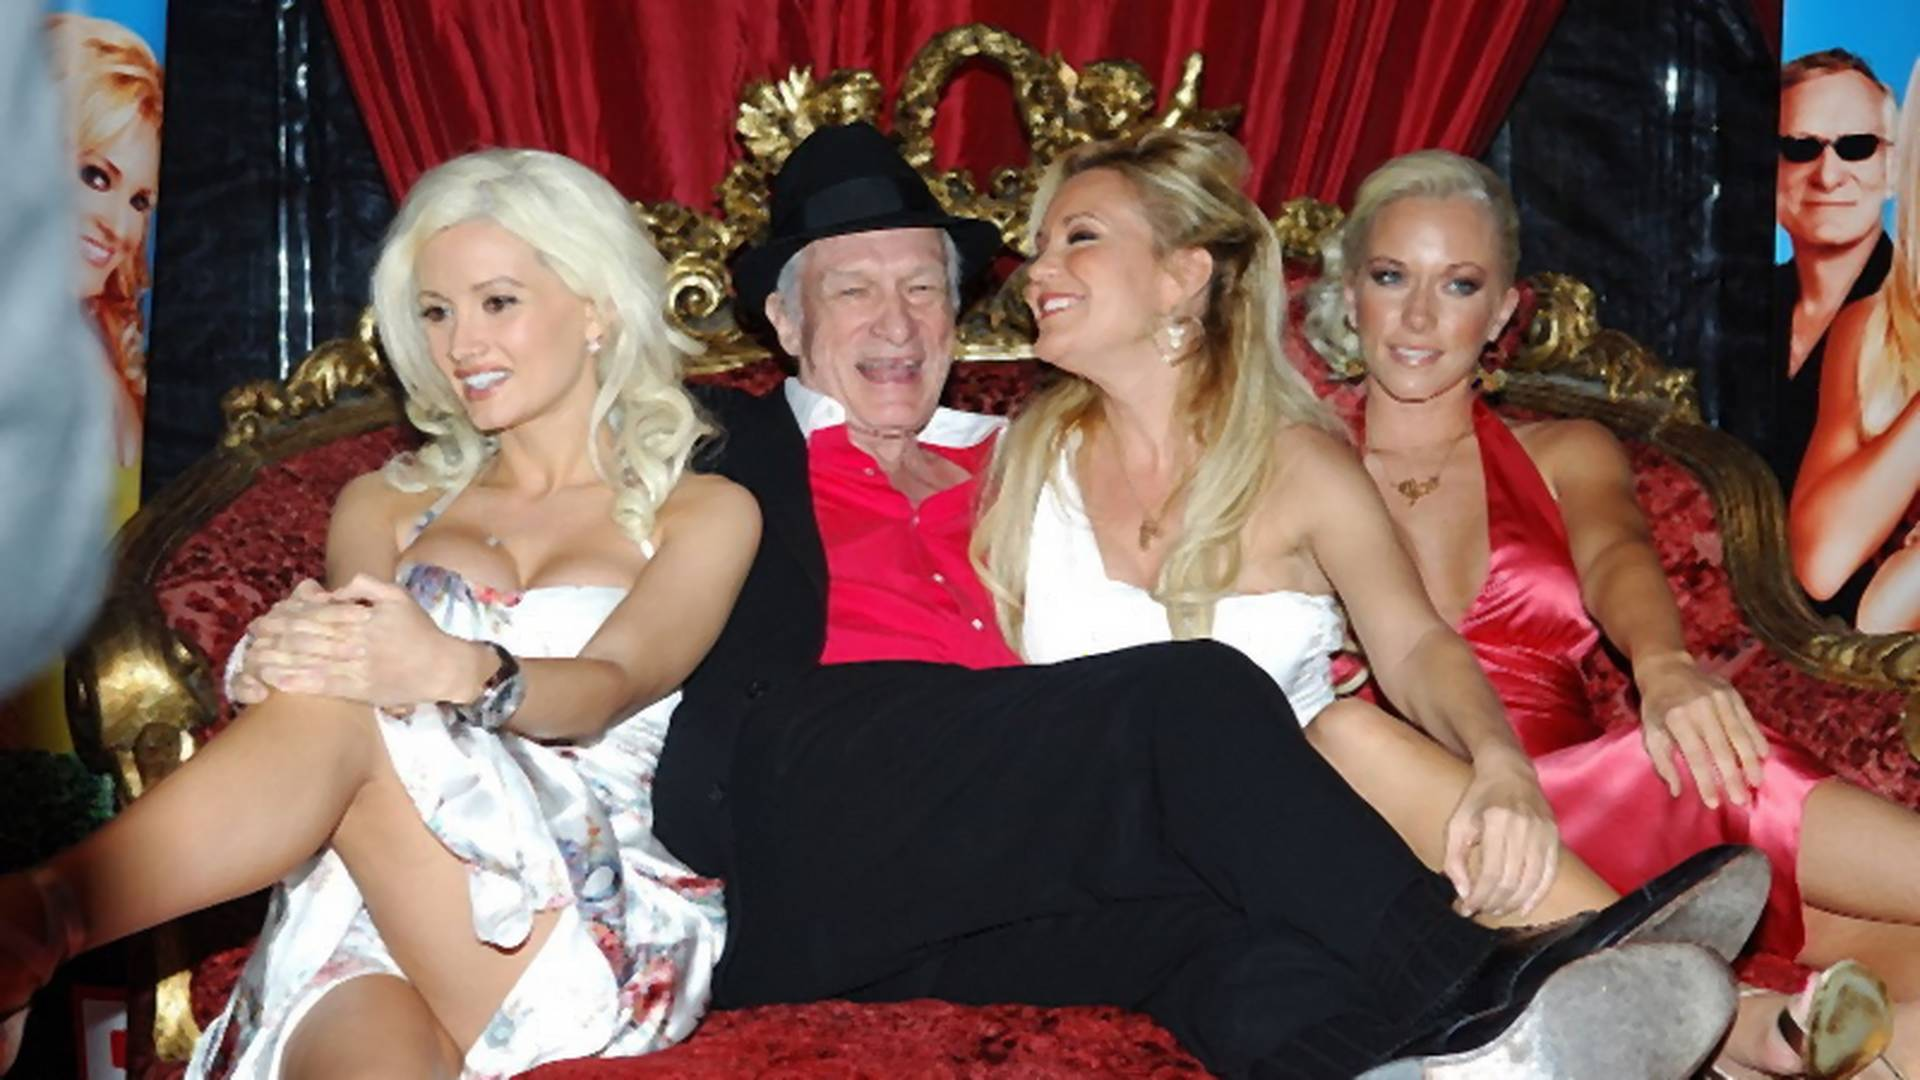 Hugh Hefner zmarł w wieku 91 lat - Hugh Hefner nie żyje